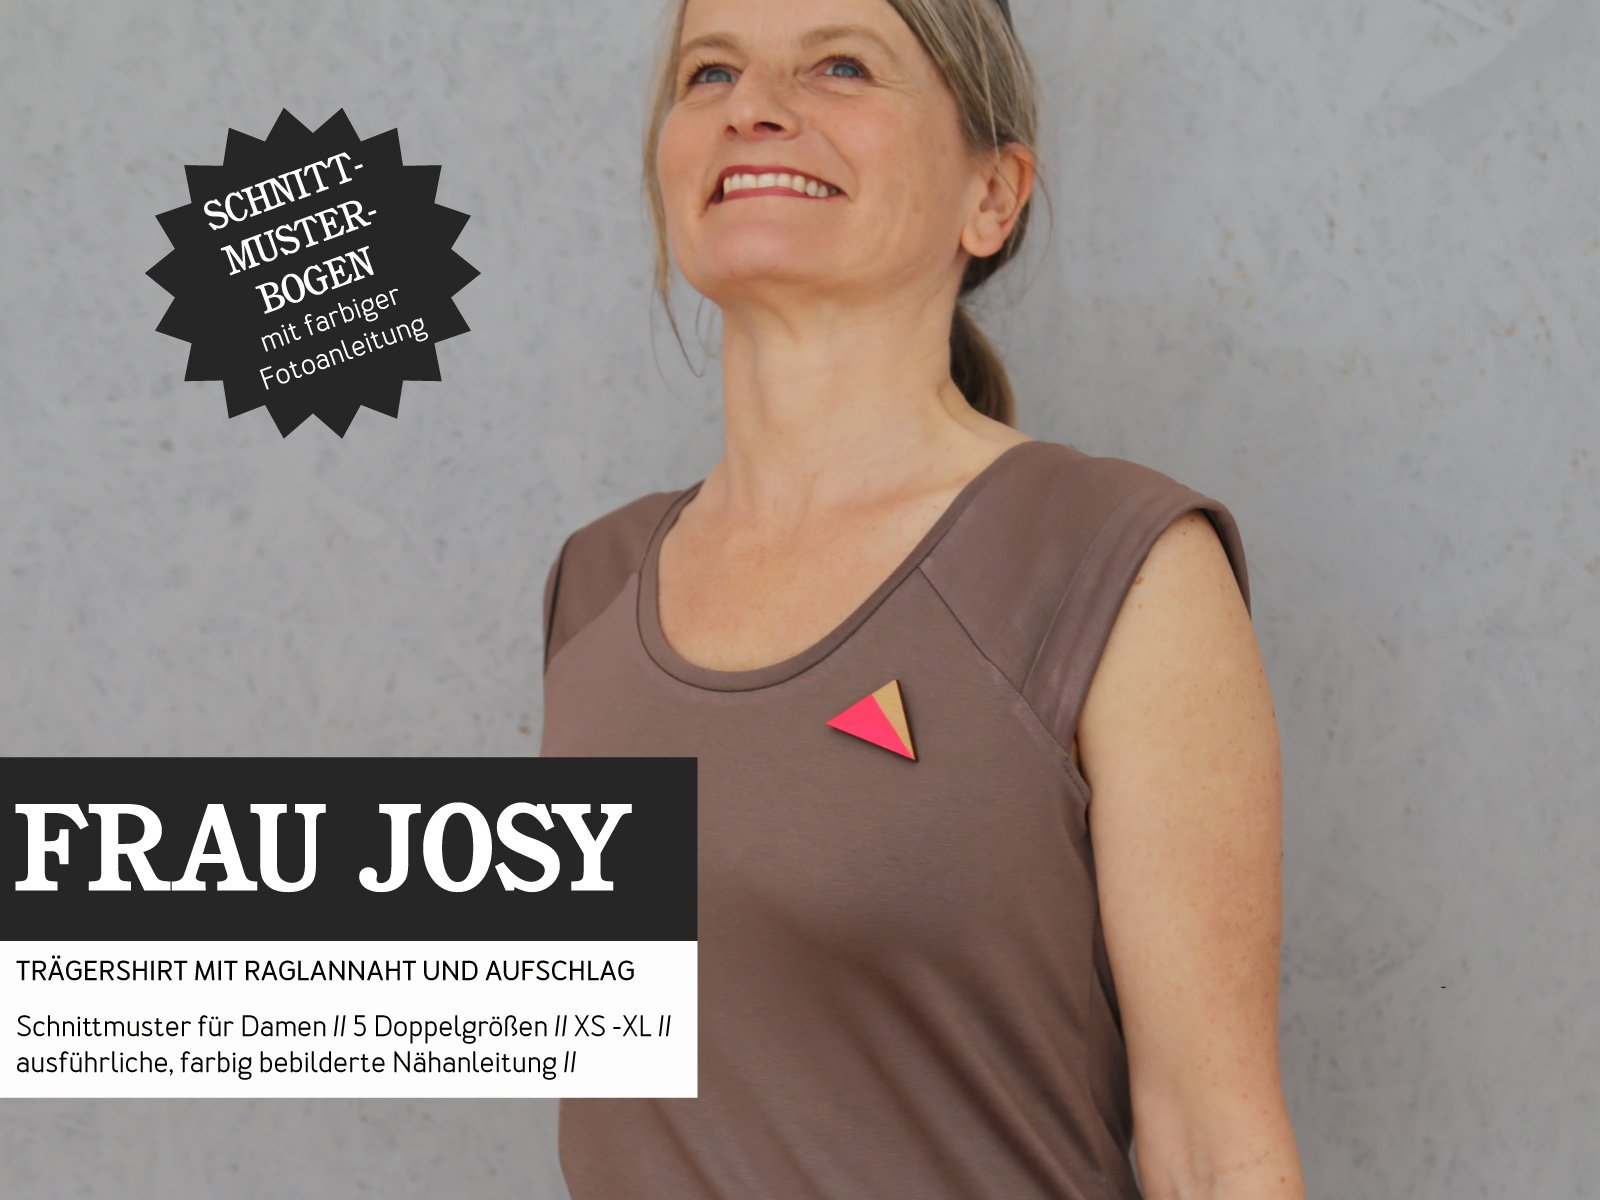 STUDIO SCHNITTREIF Frau Josy Trägershirt - Papierschnittmuster